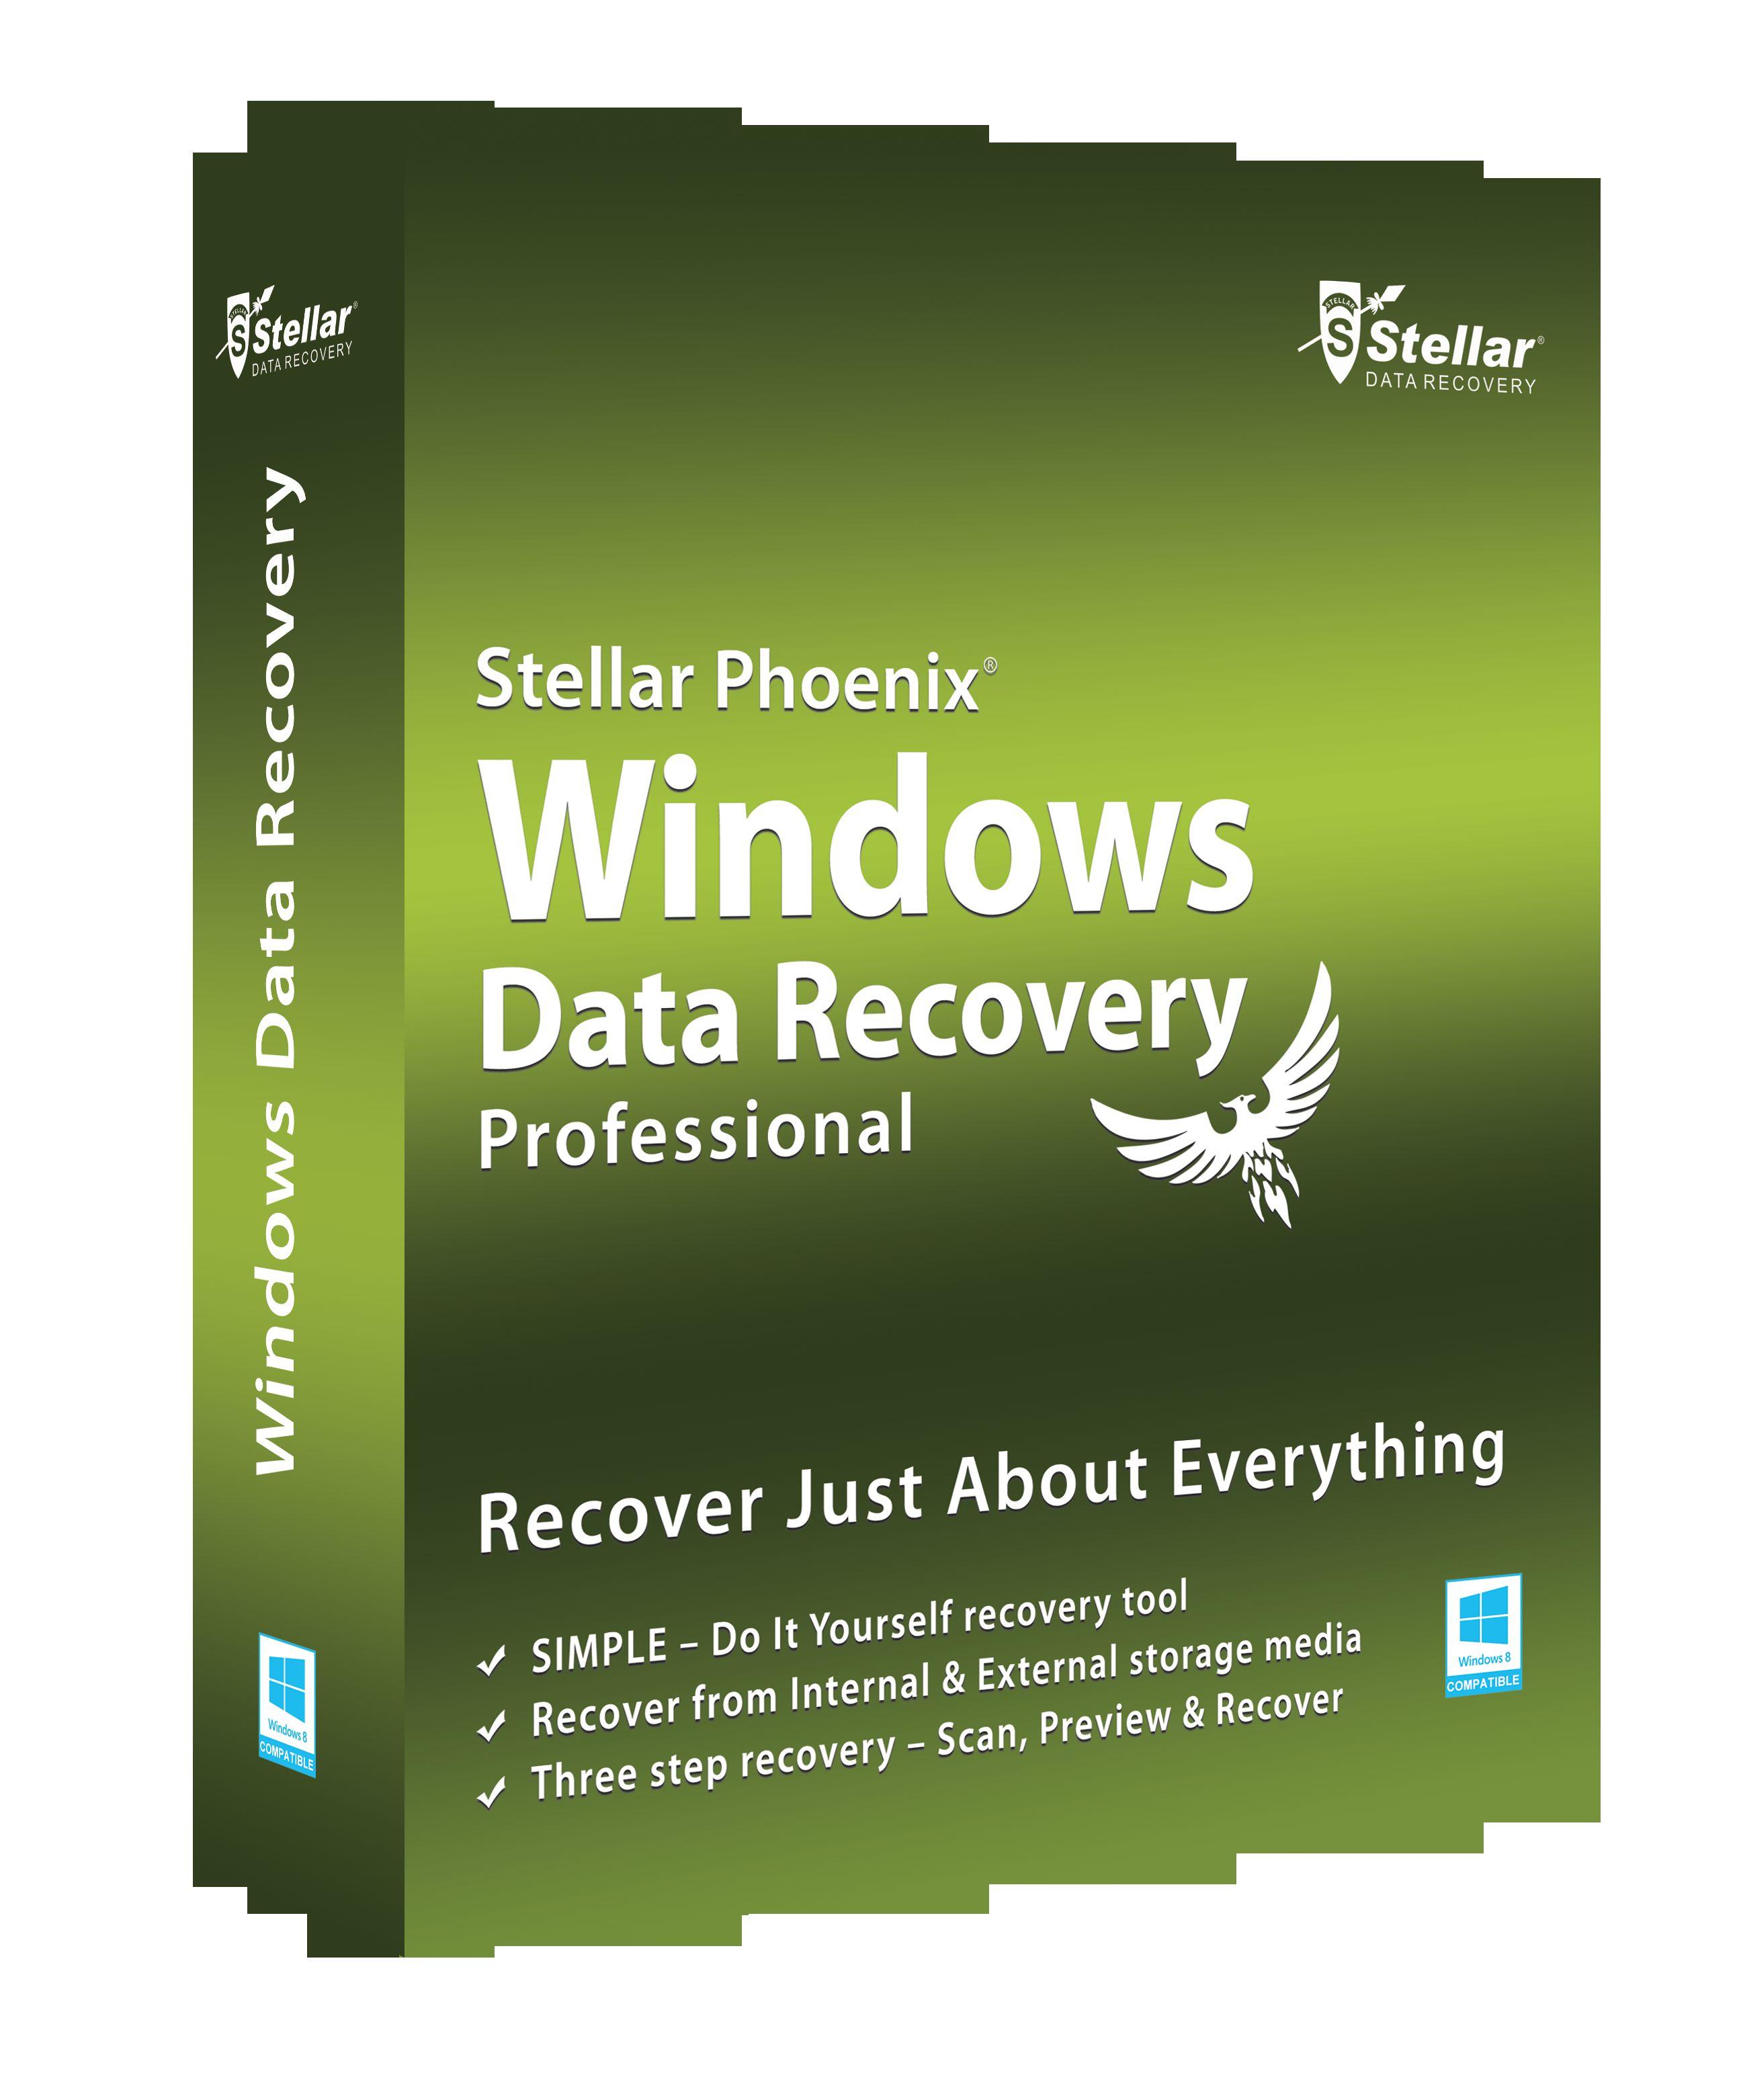 stellar phoenix windows data recovery 5.0 crack free download